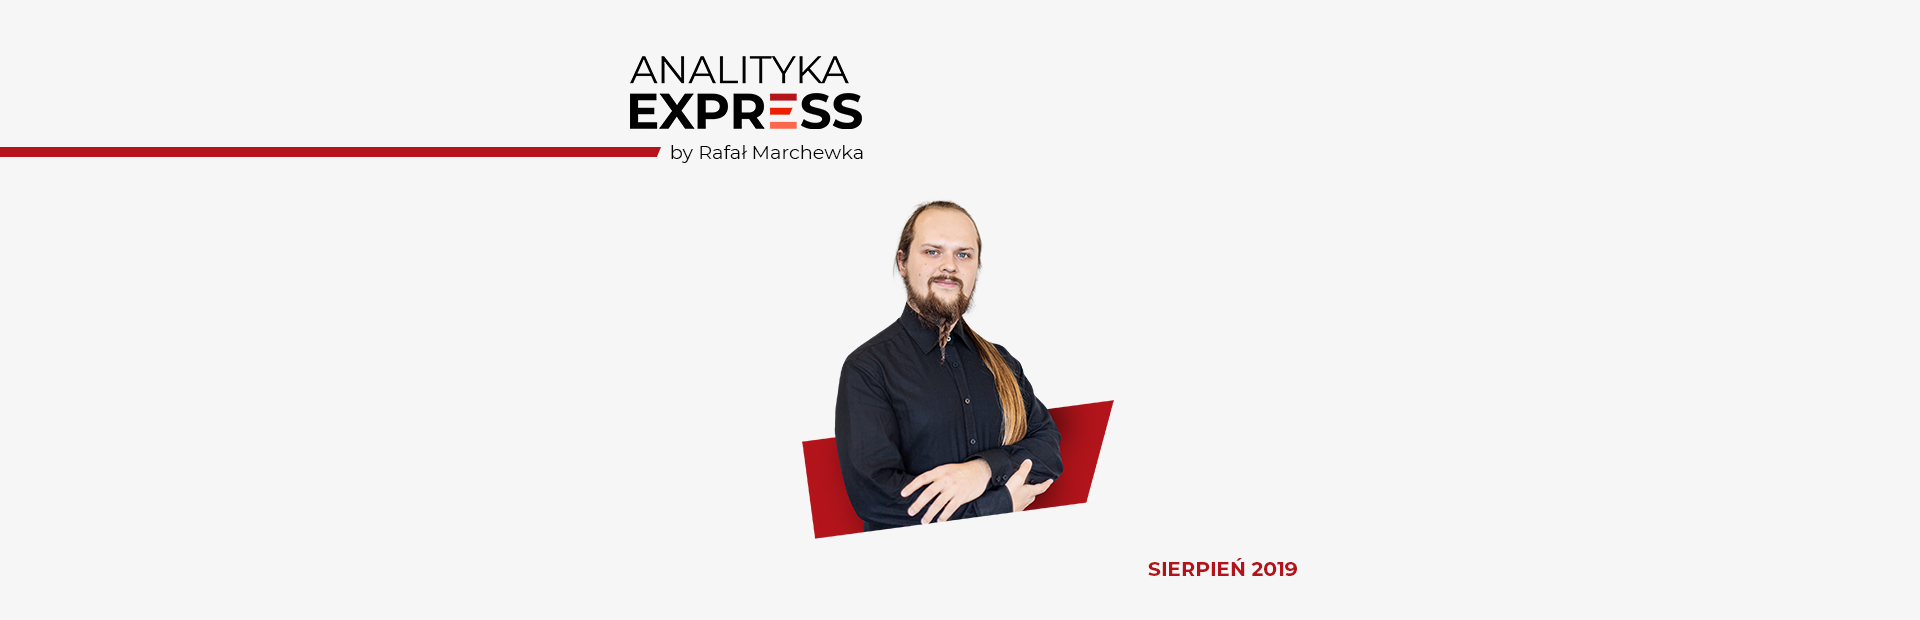 Analityka Express 8/2019